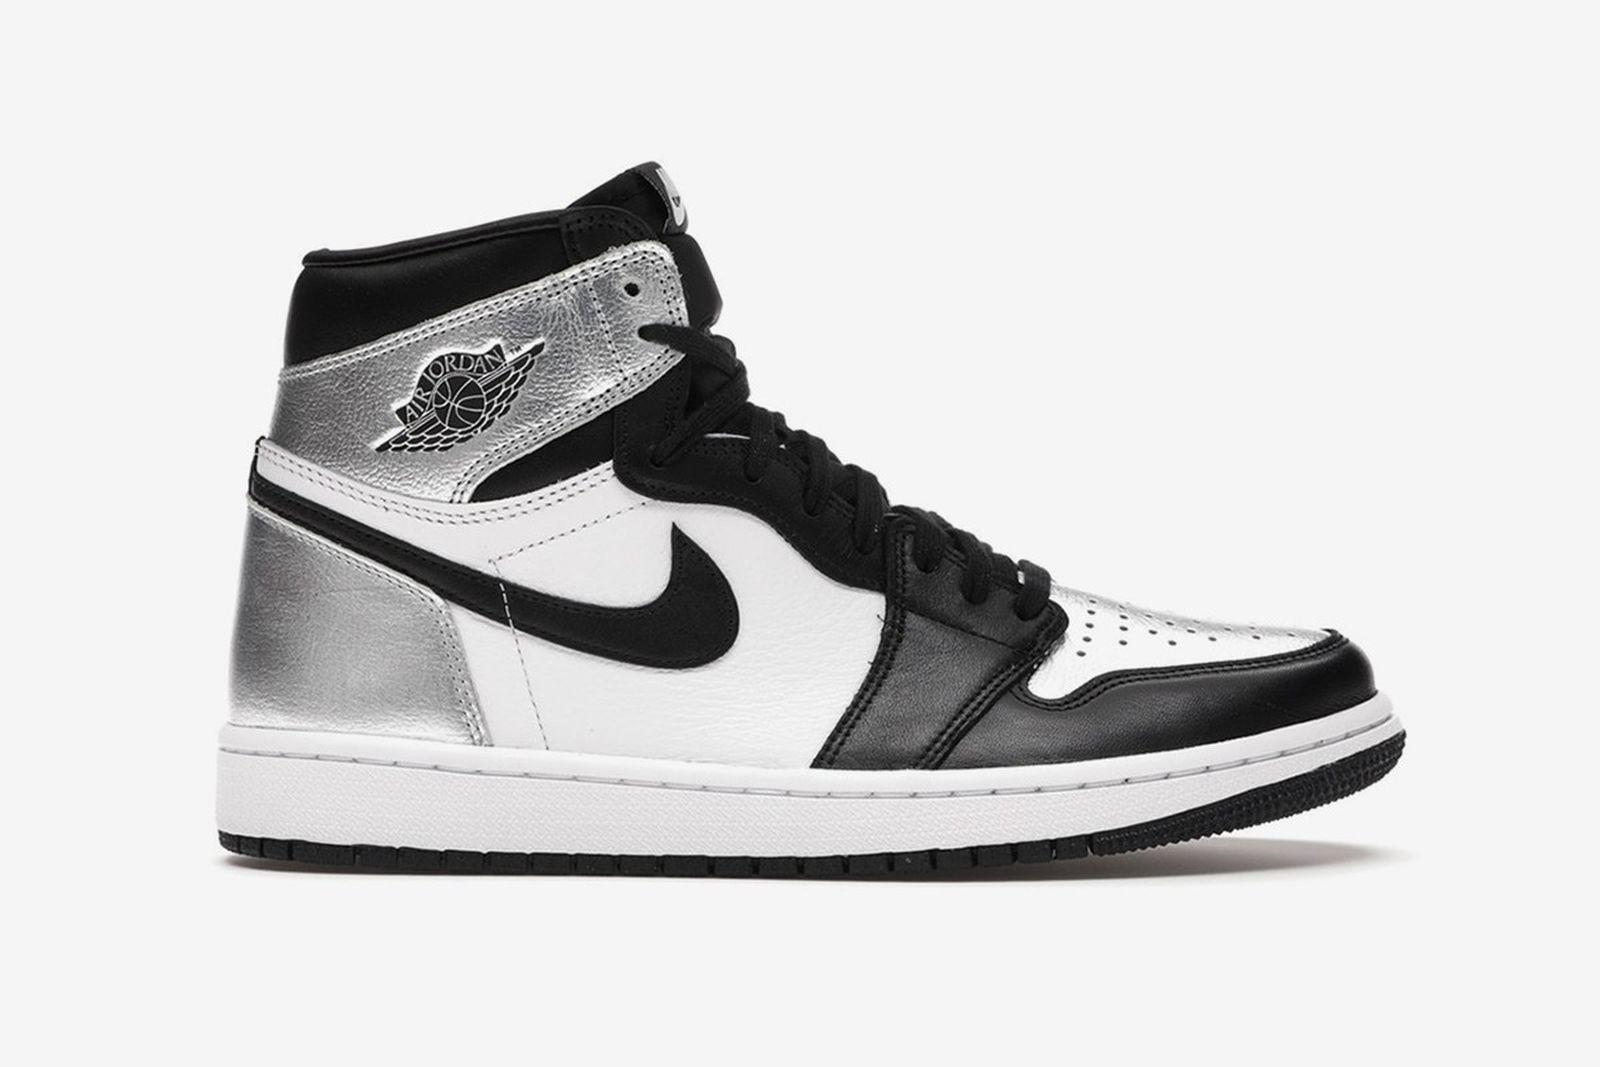 Nike Air Force 1 LV8 (Kids) - 820438-603 - Sneakerhead.com